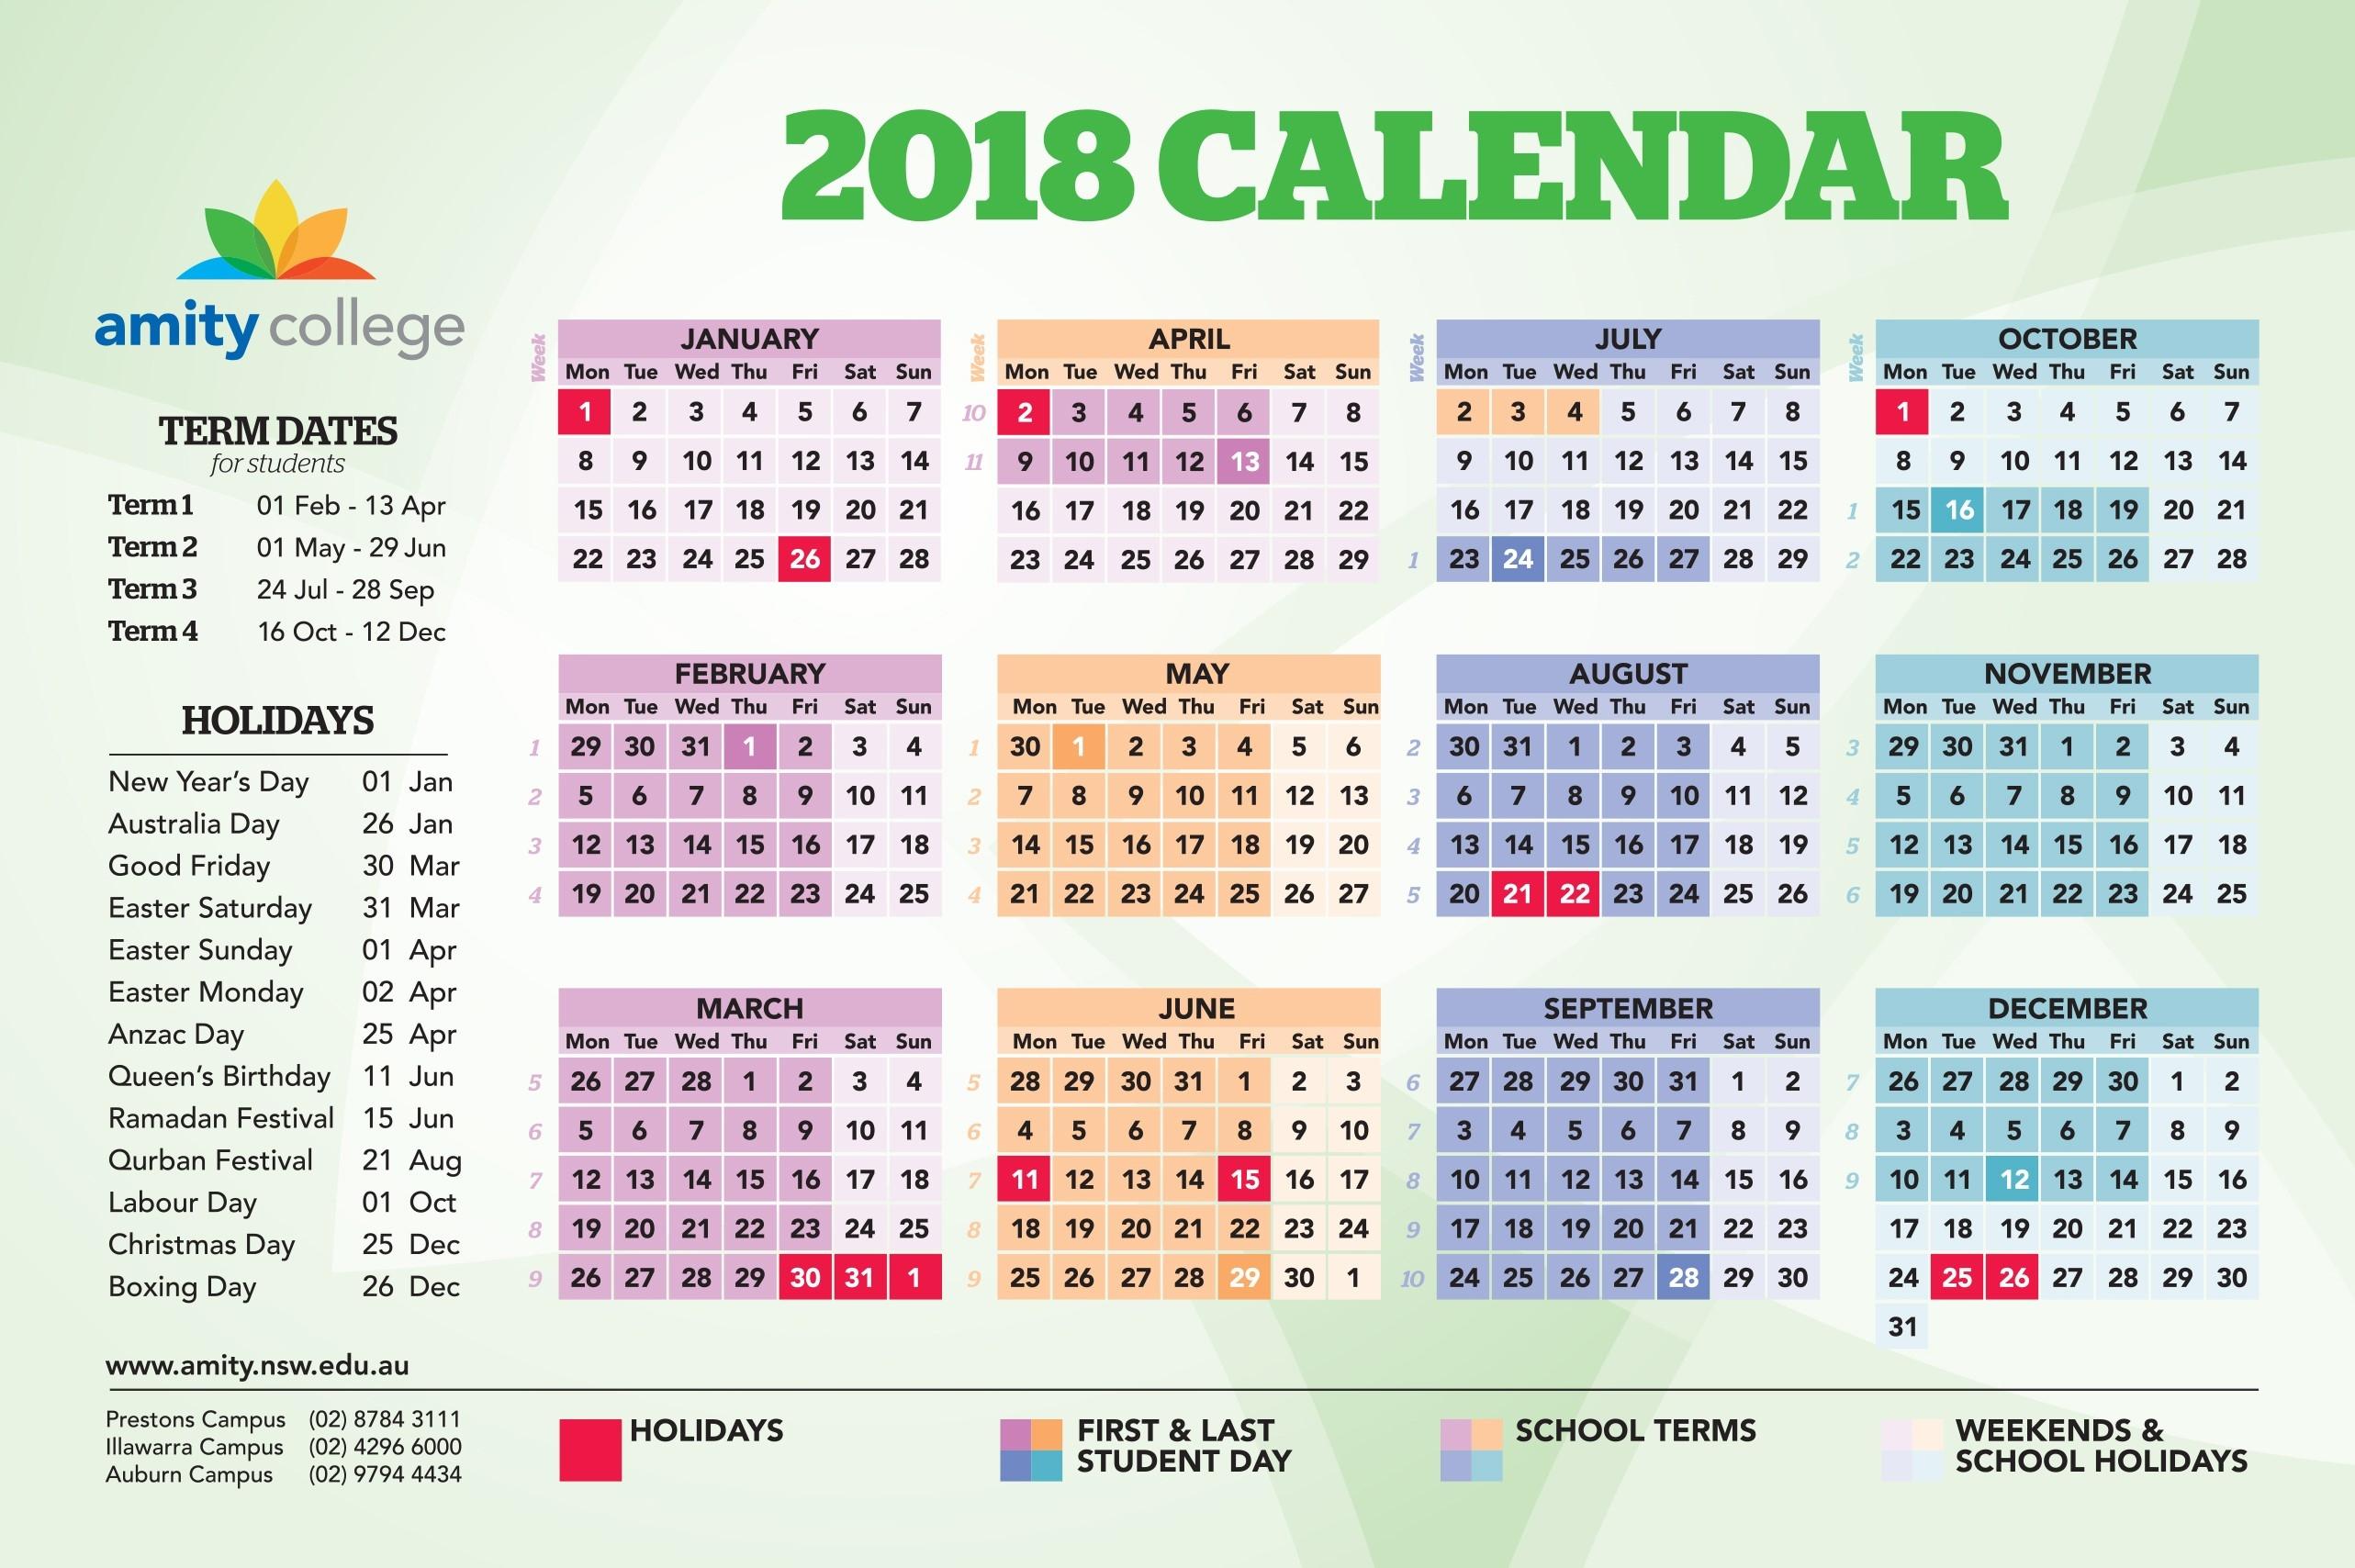 event calendar amity college Nsw School Holidays 2018 Calendar erdferdf